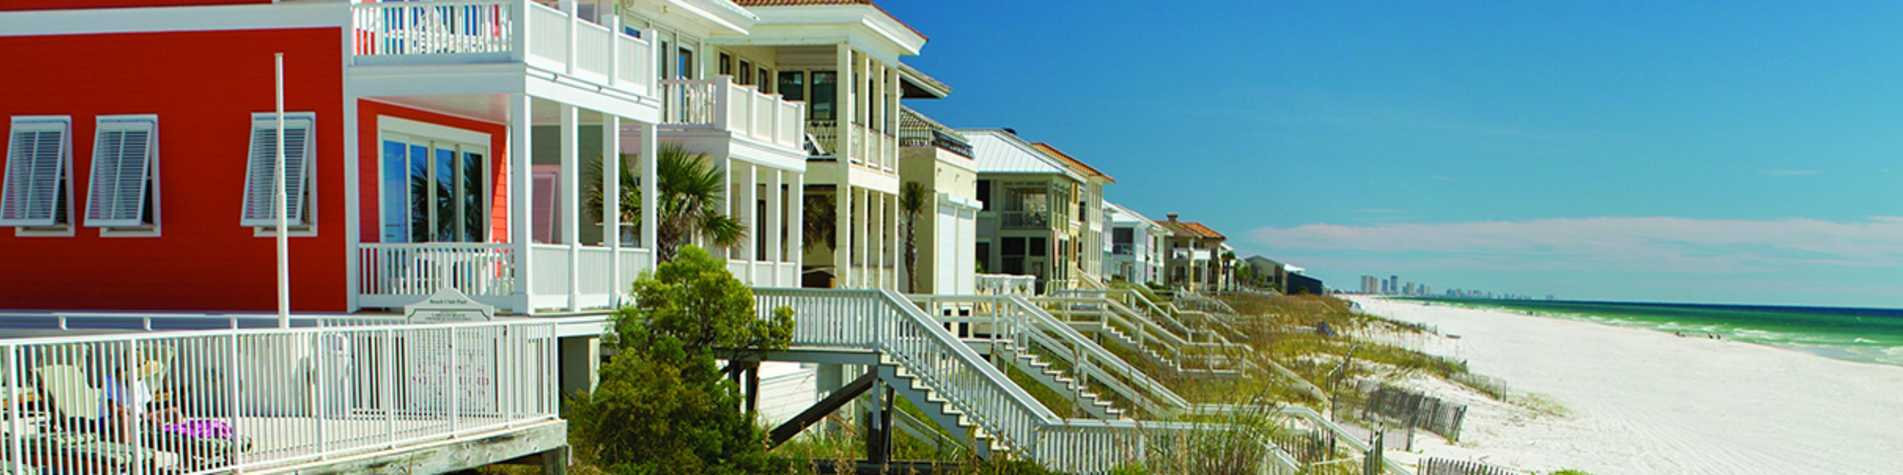 Beach Houses Townhome Rentals Panama City Beach Fl